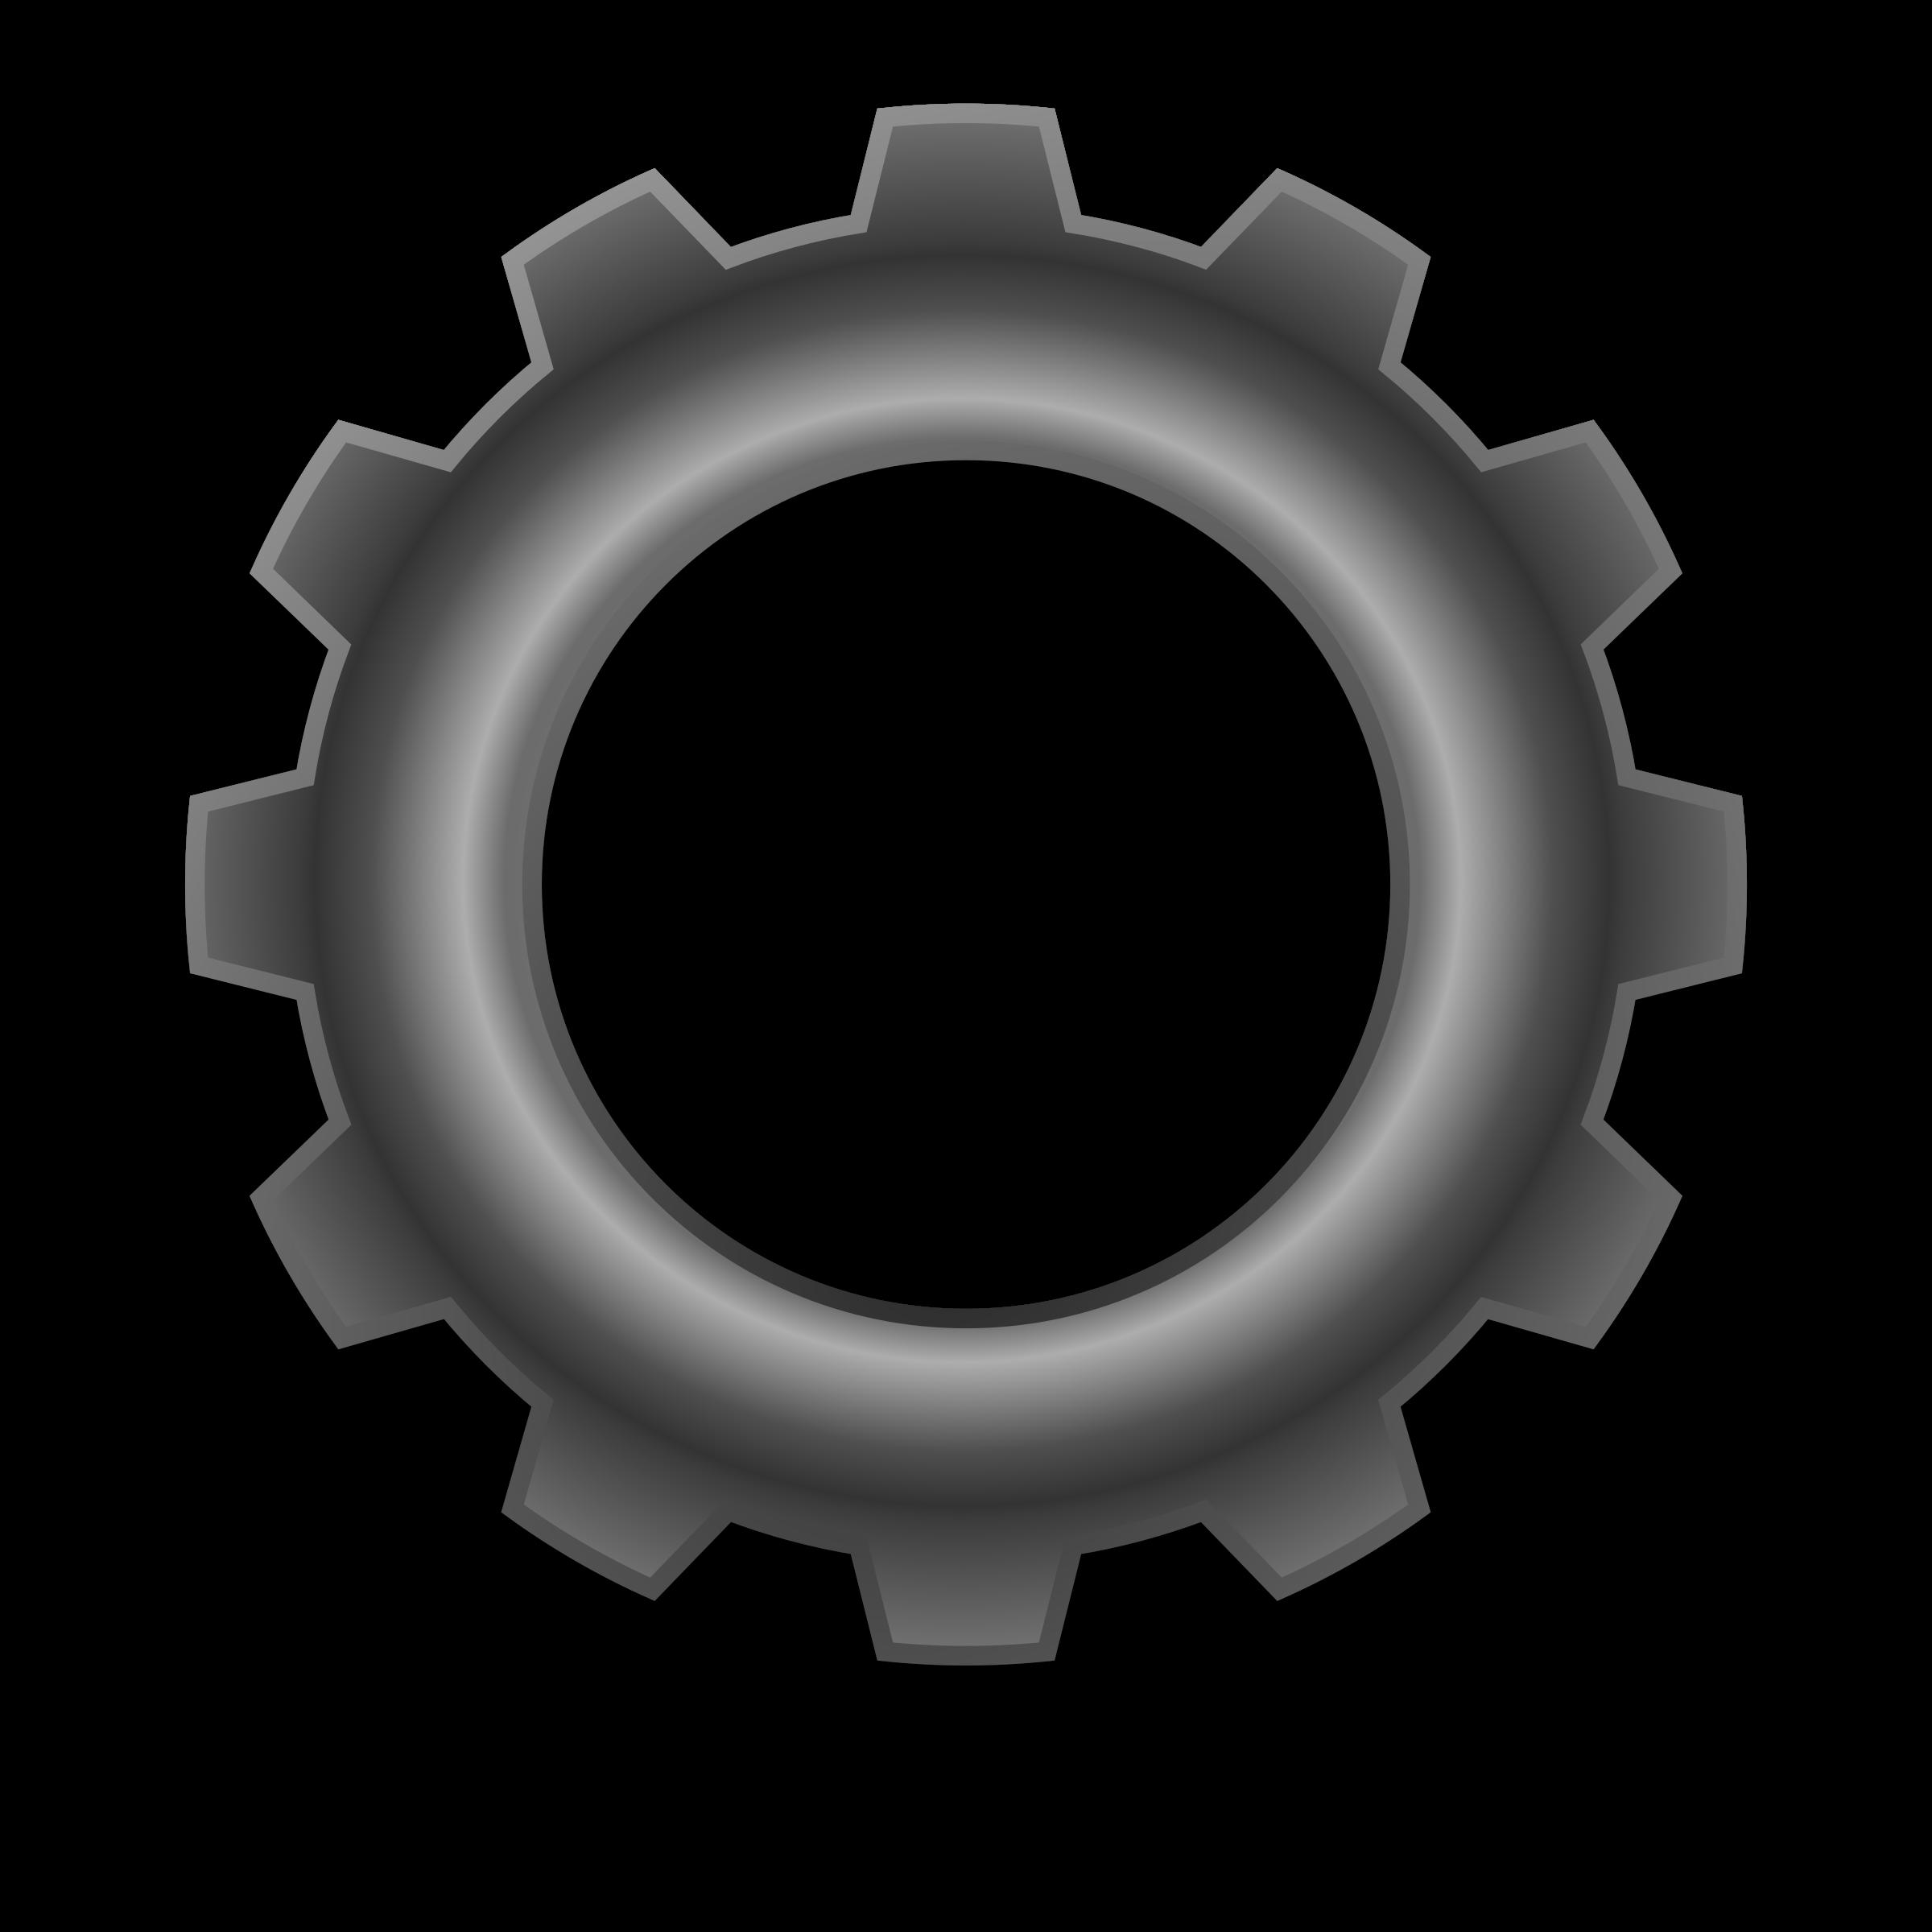 Gear clipart cogwheel. Metal cog icons png